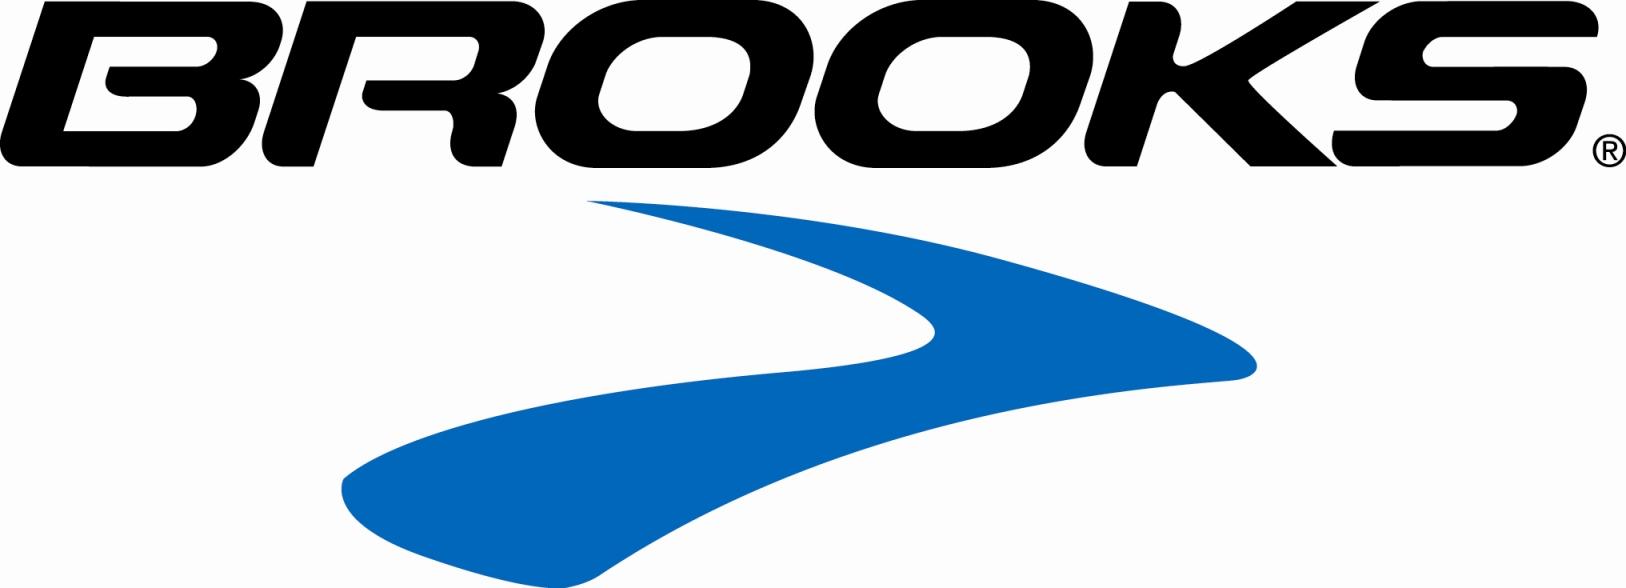 Brooks LTD Logo photo - 1